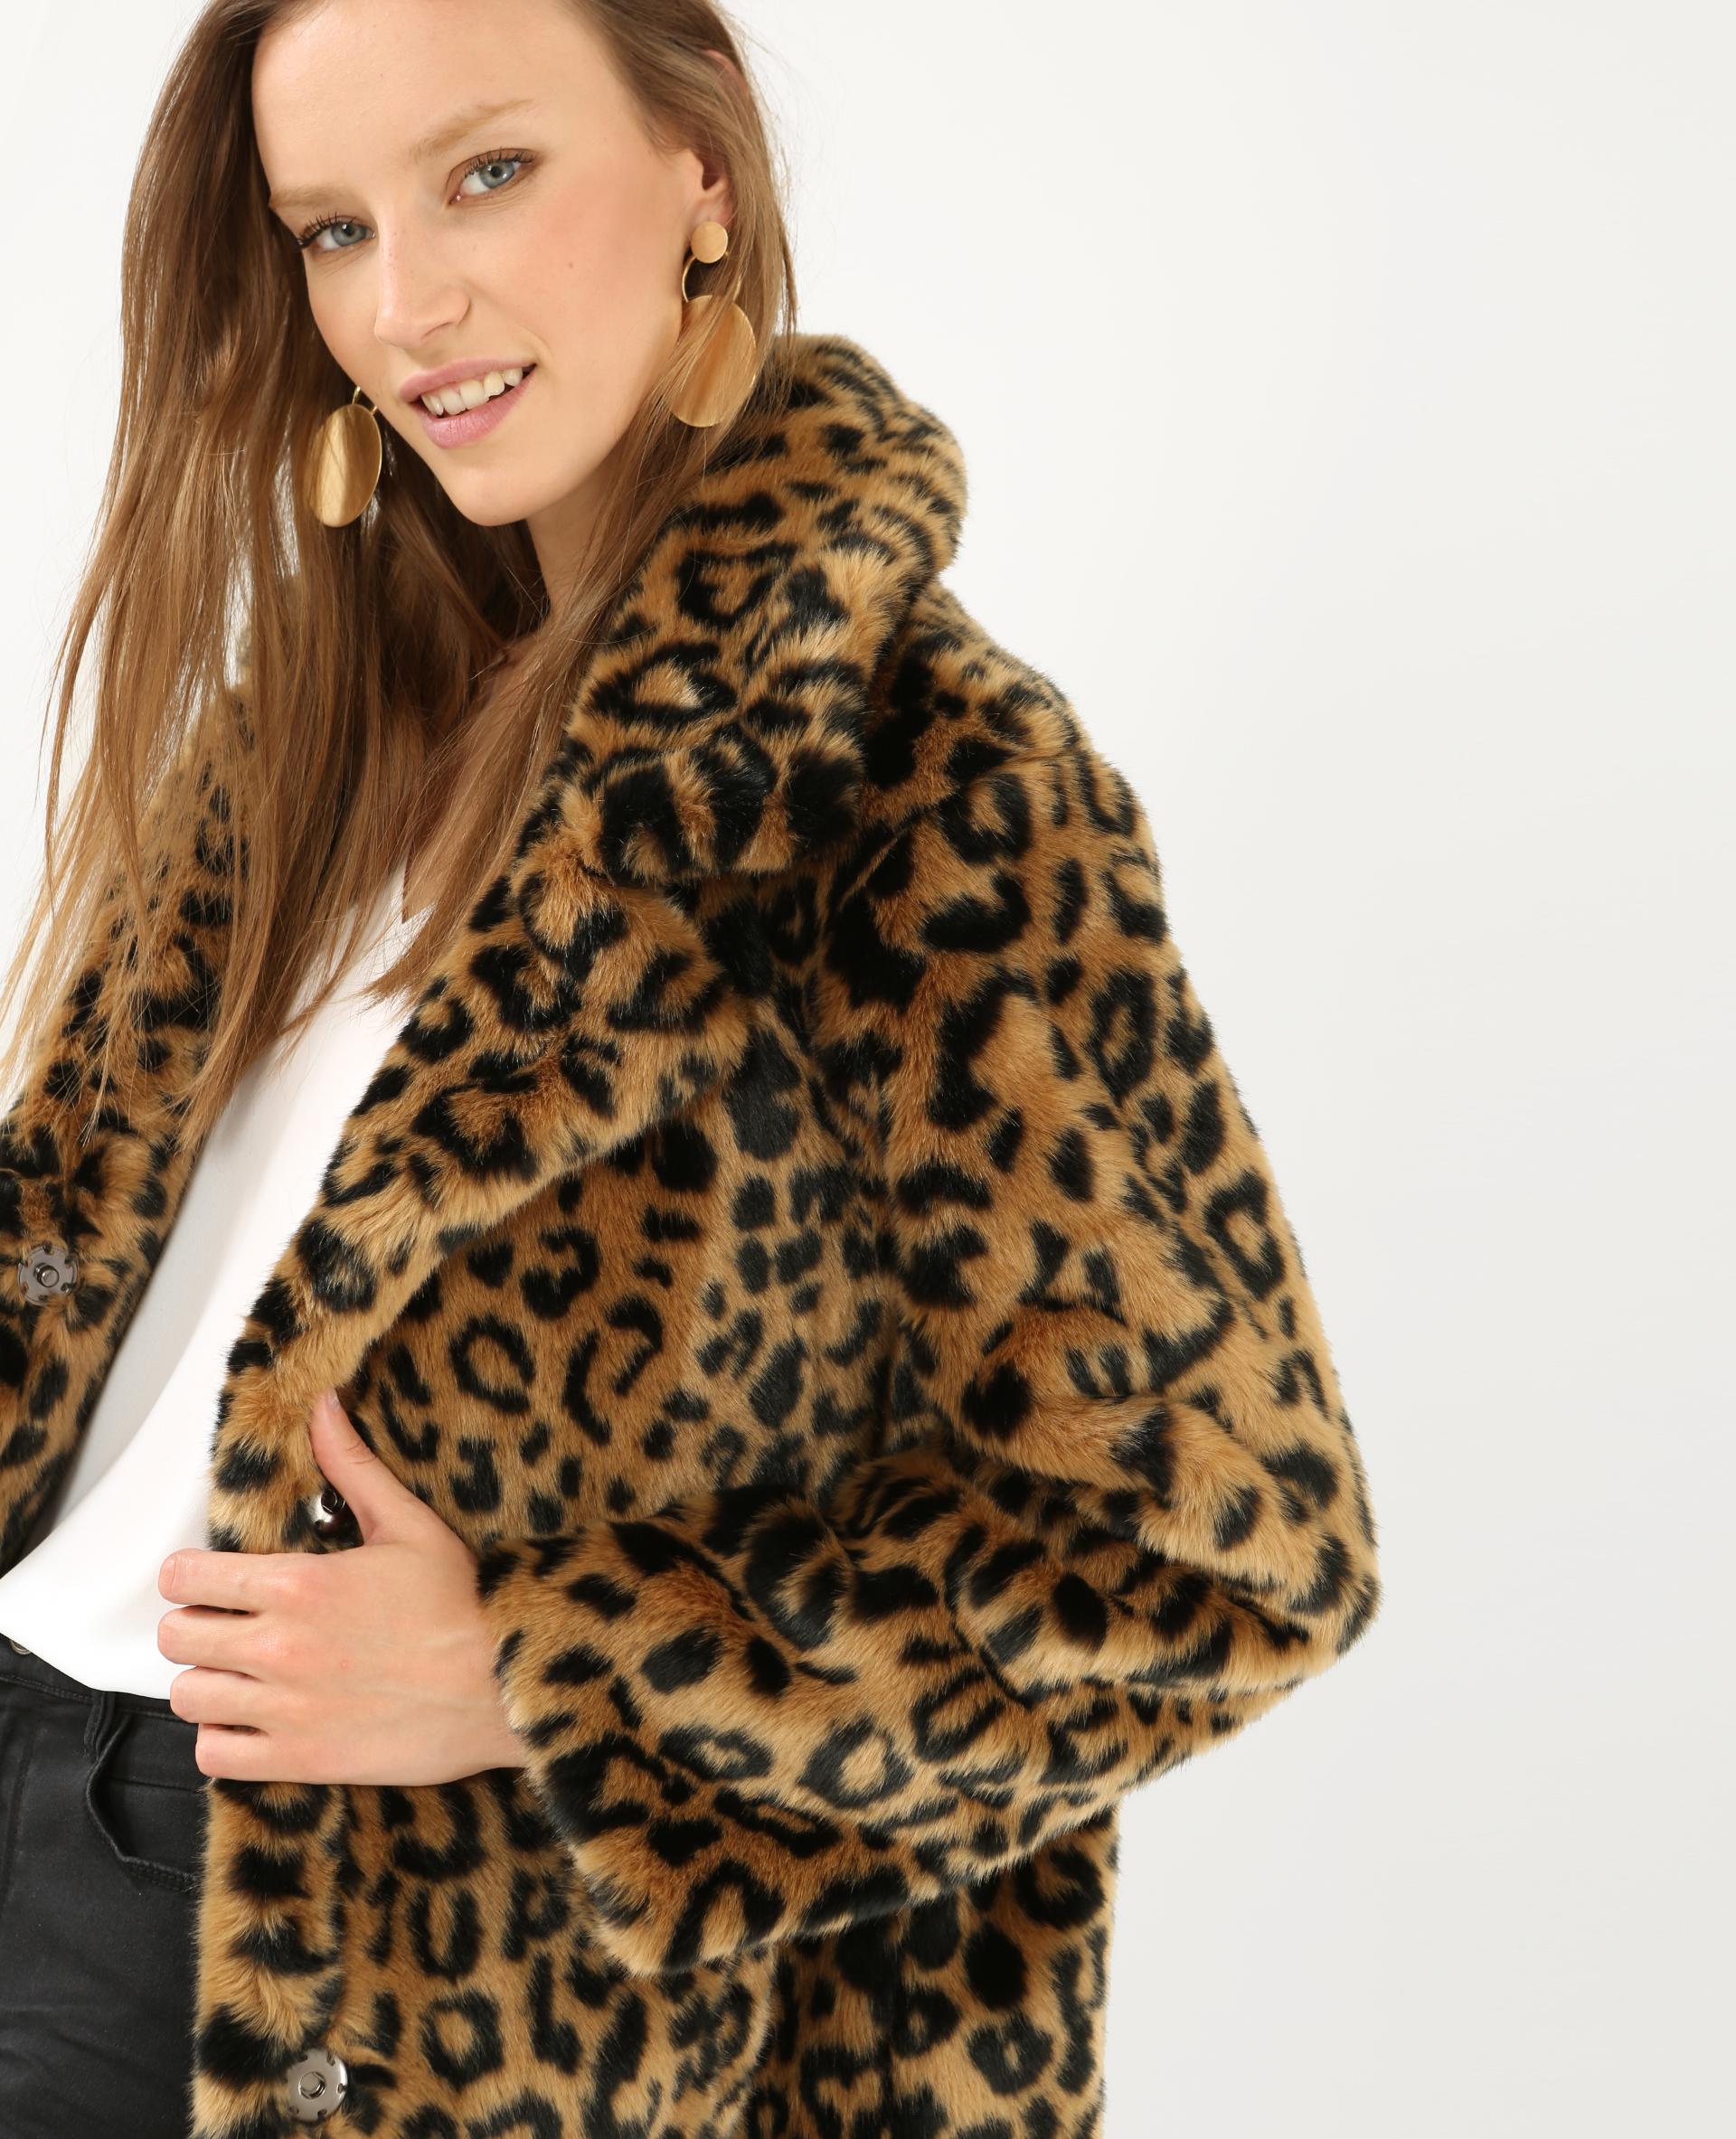 manteau l opard fausse fourrure beige 280147714i08 pimkie. Black Bedroom Furniture Sets. Home Design Ideas